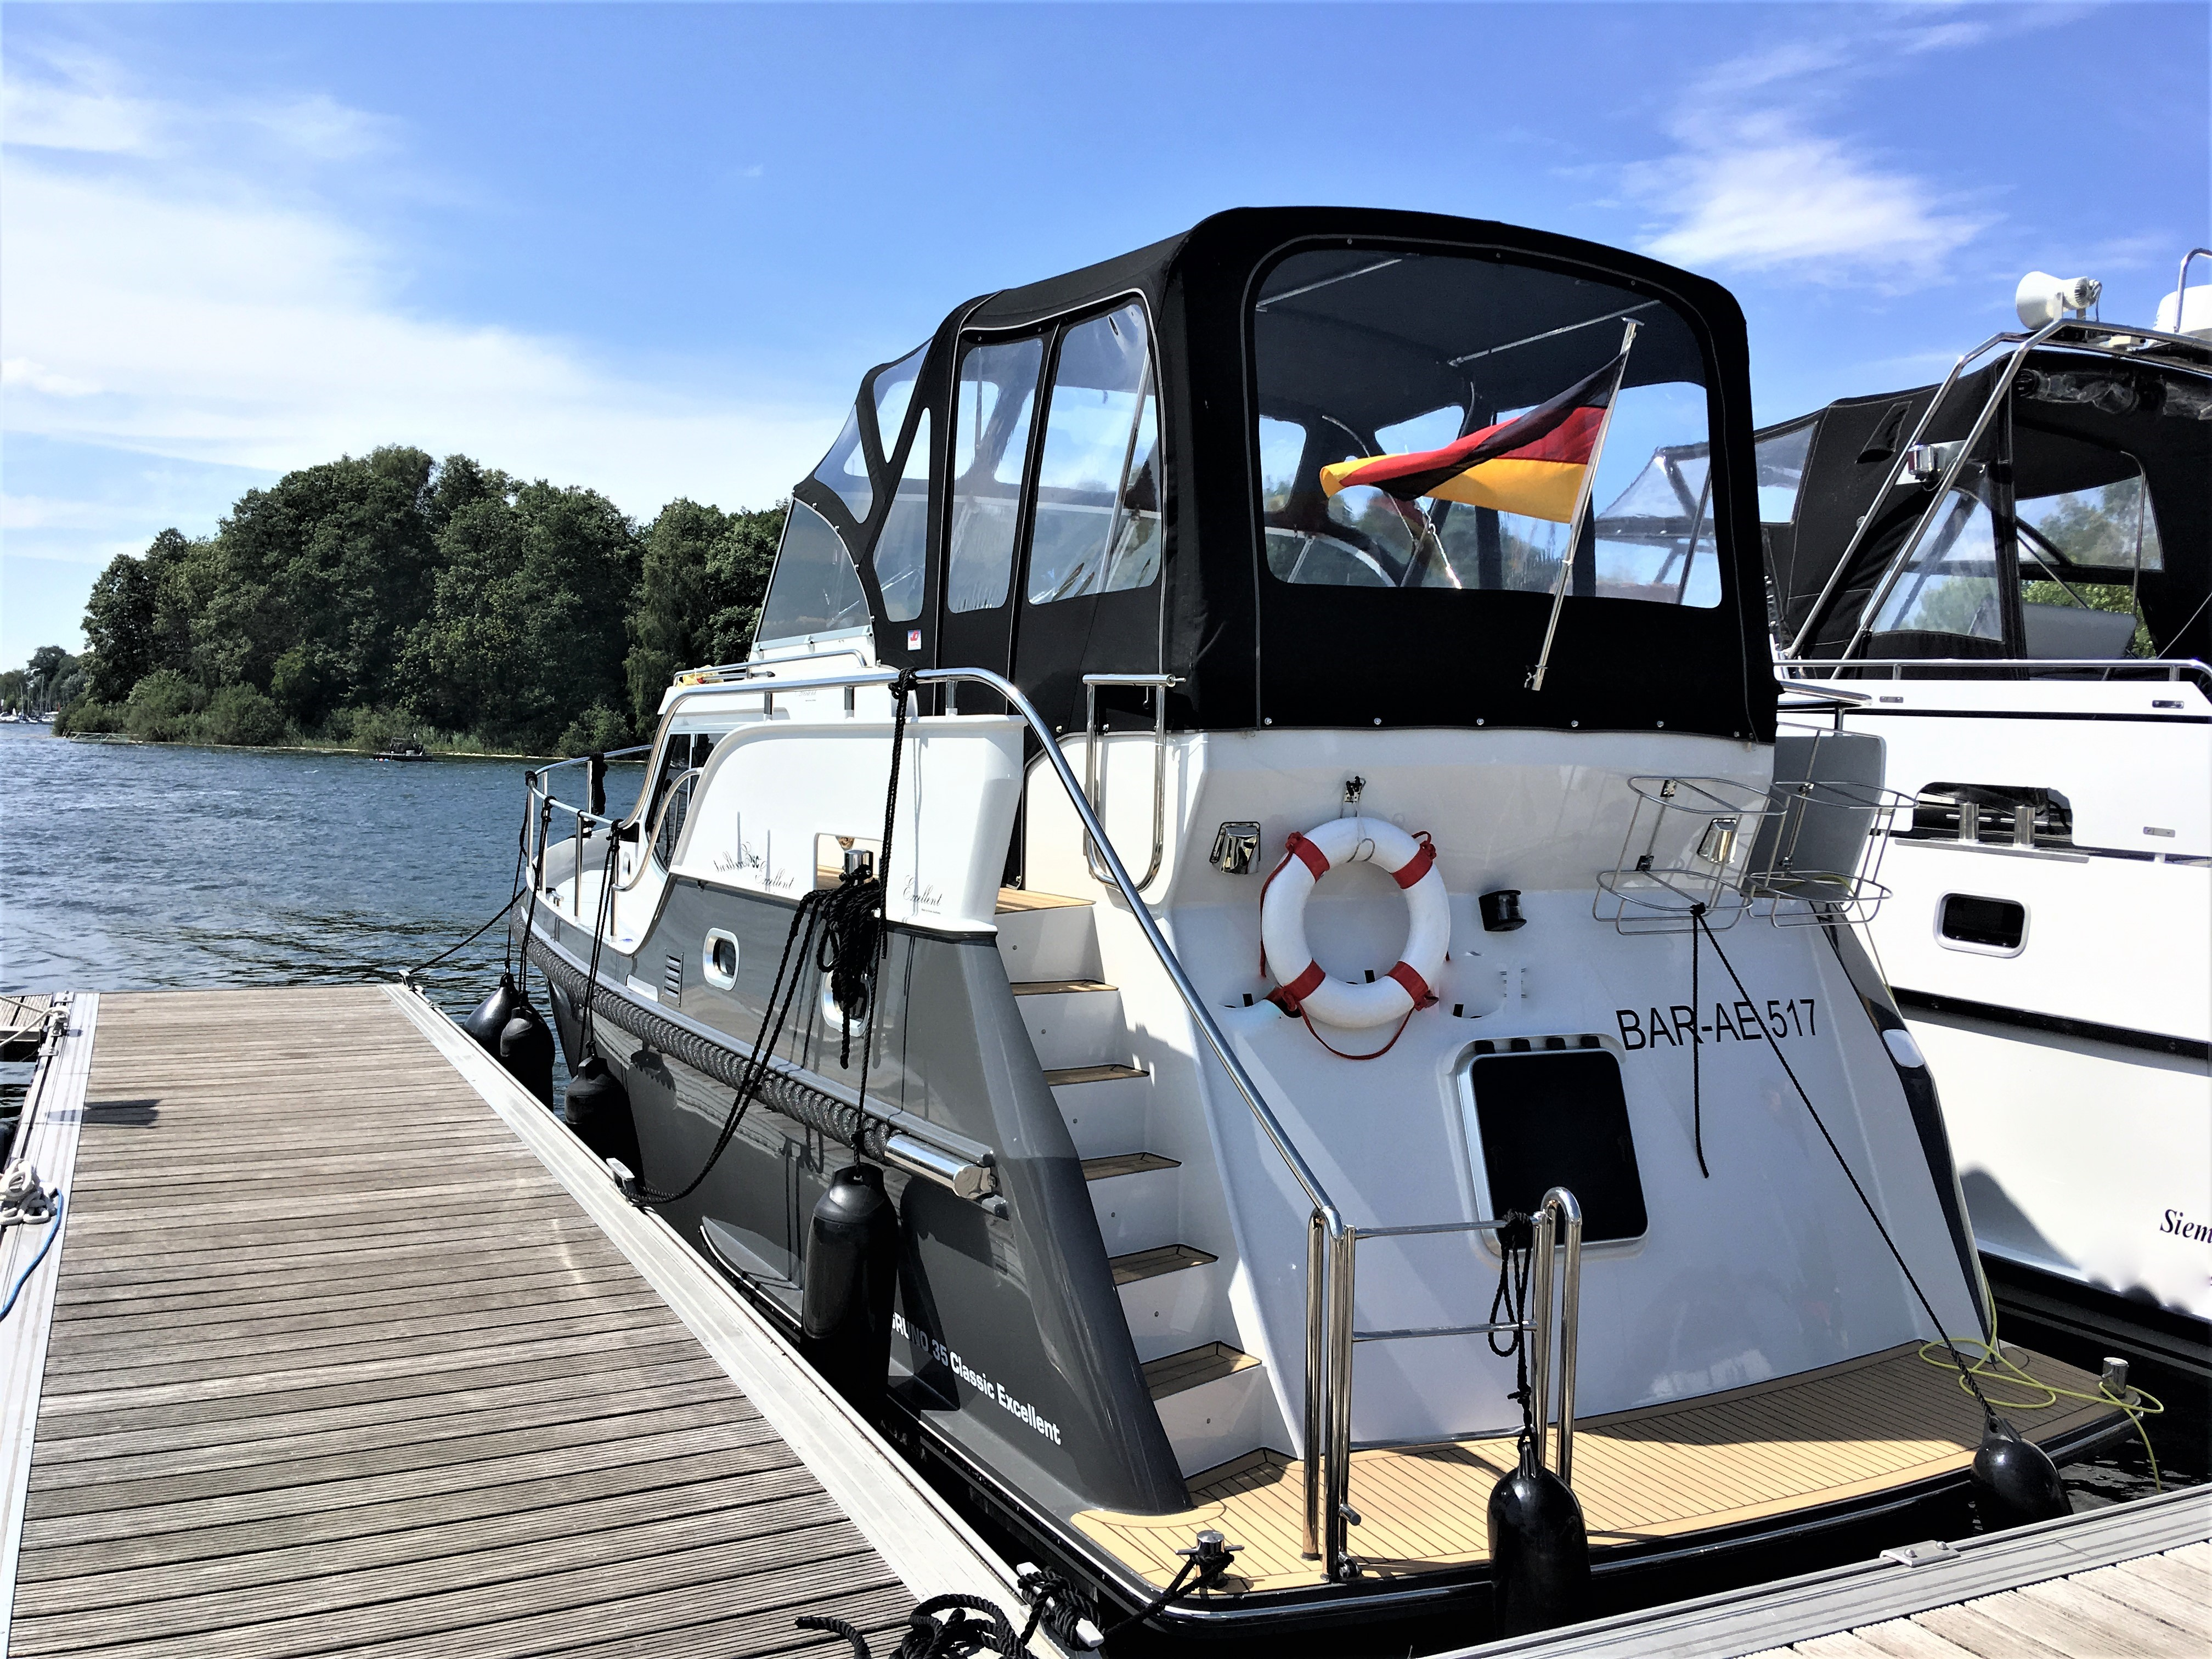 https://relax-yachtcharter.de/wp-content/uploads/2019/08/IMG_2501.jpg